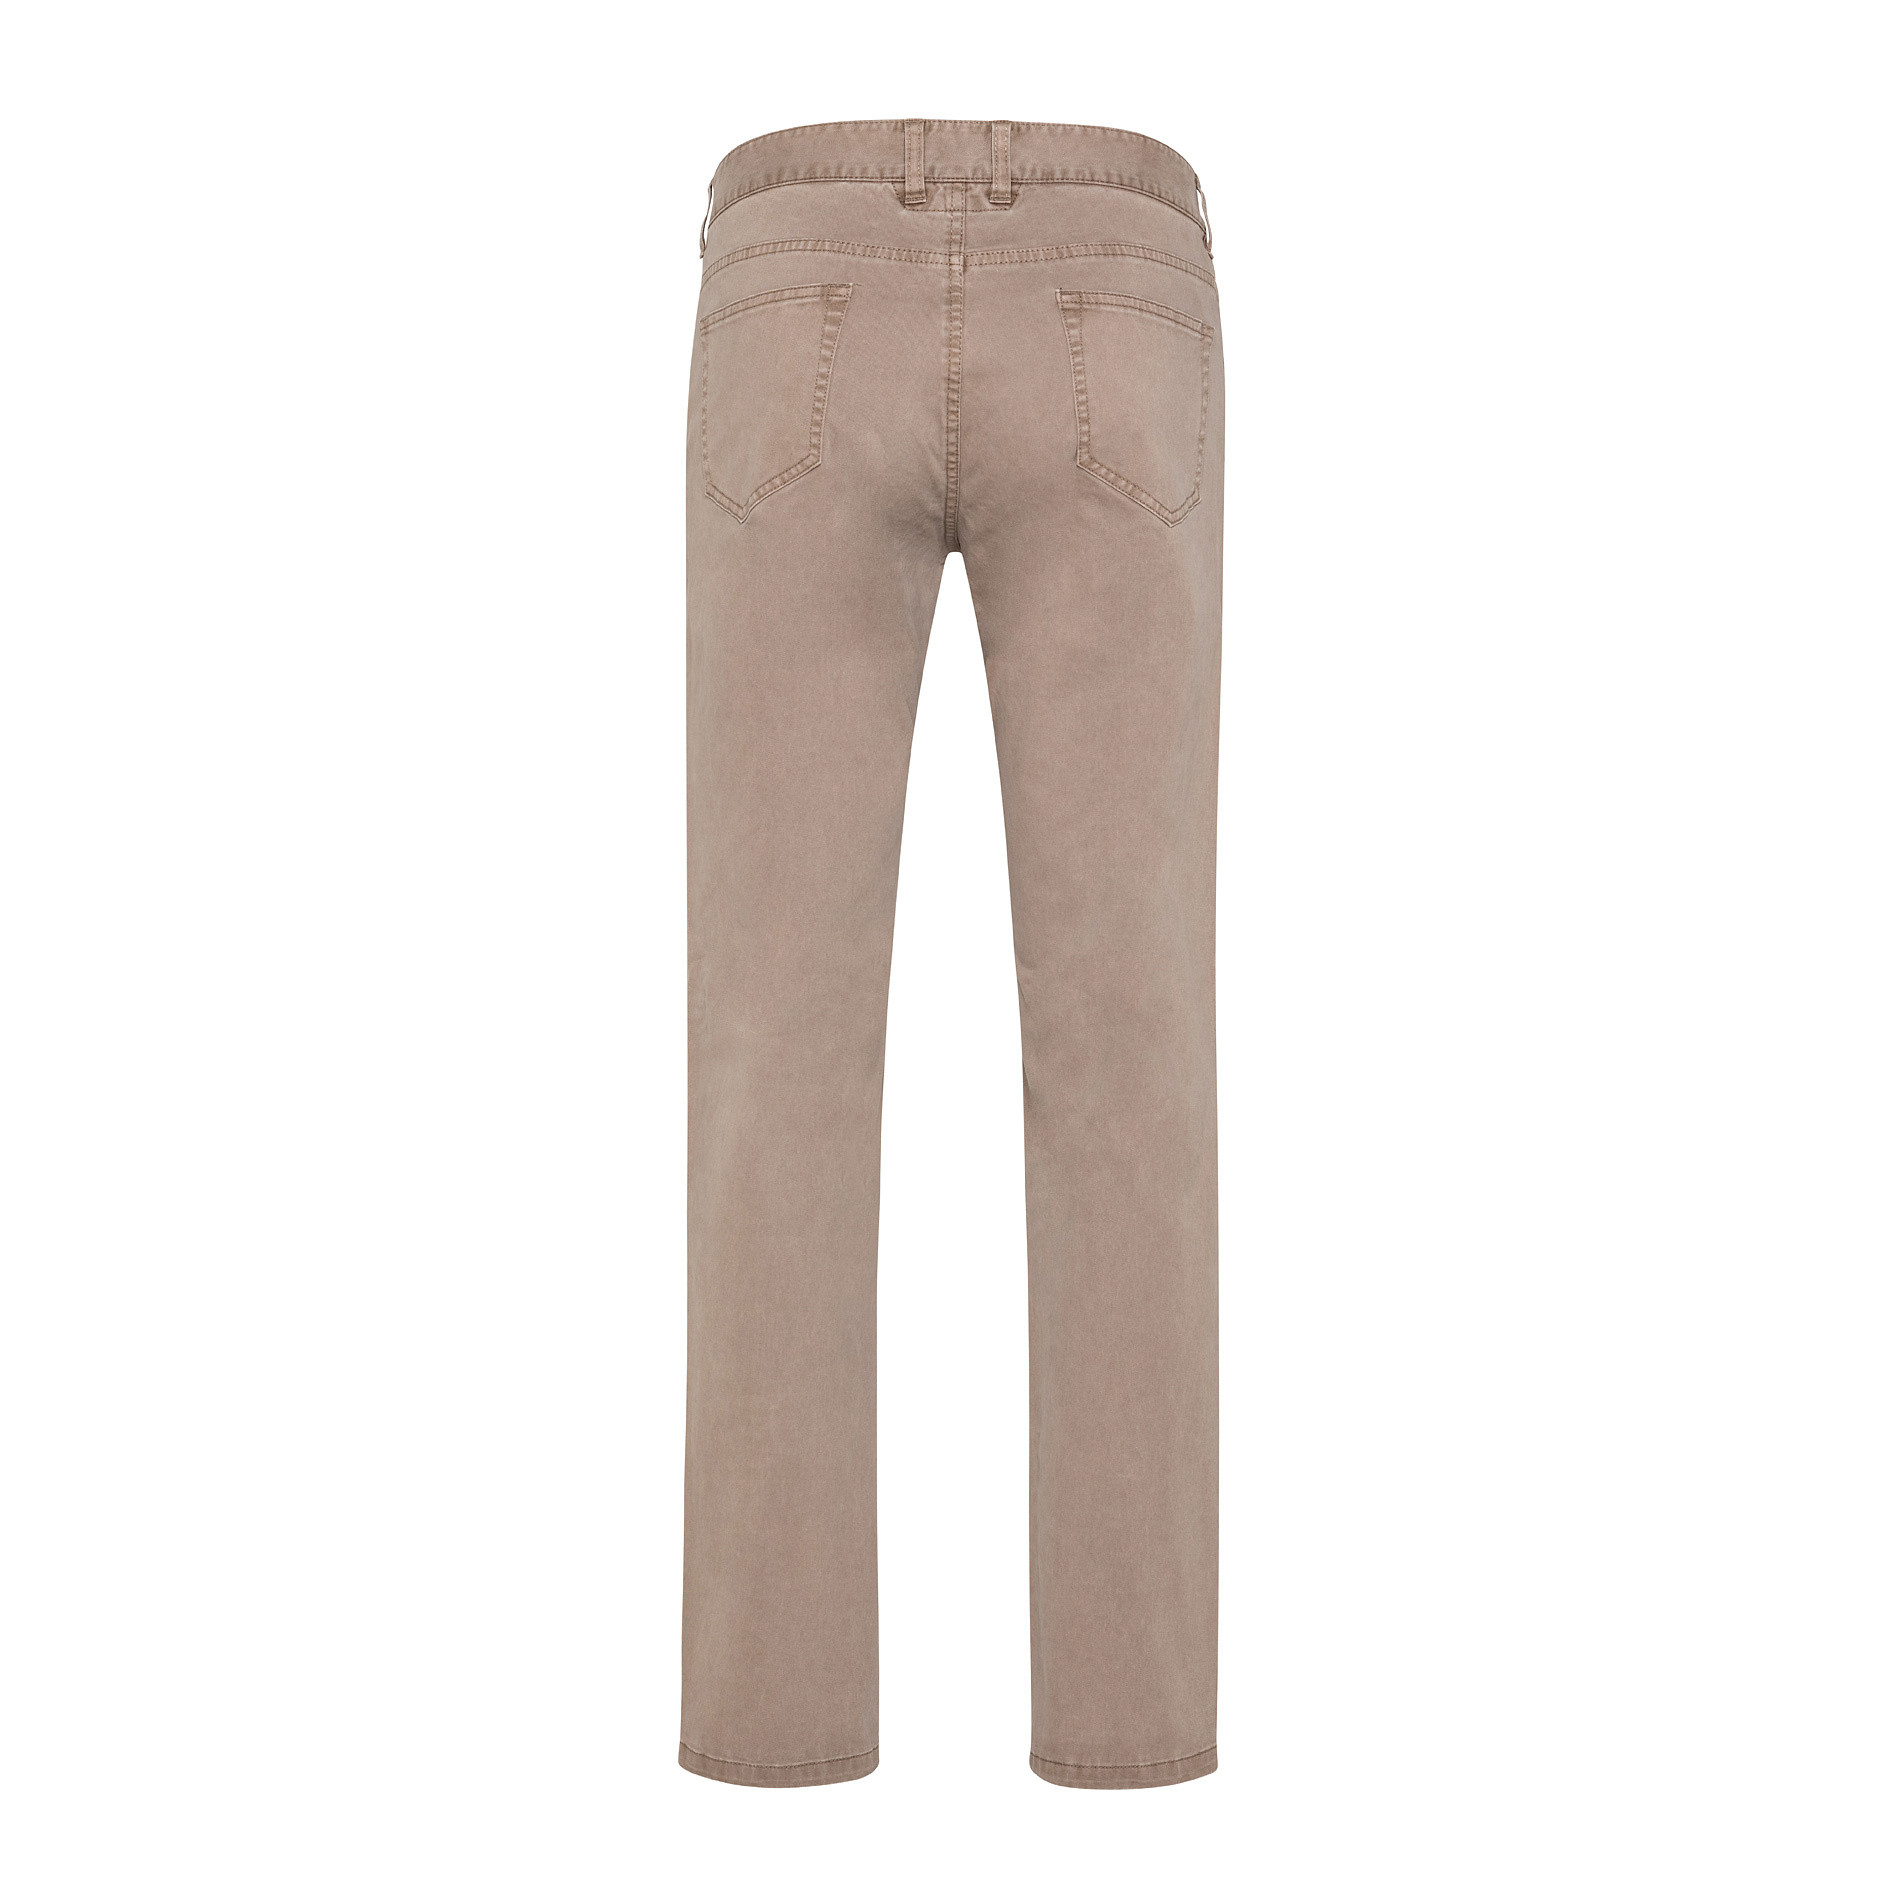 Pantaloni chino in tessuto stretch, Beige, large image number 1